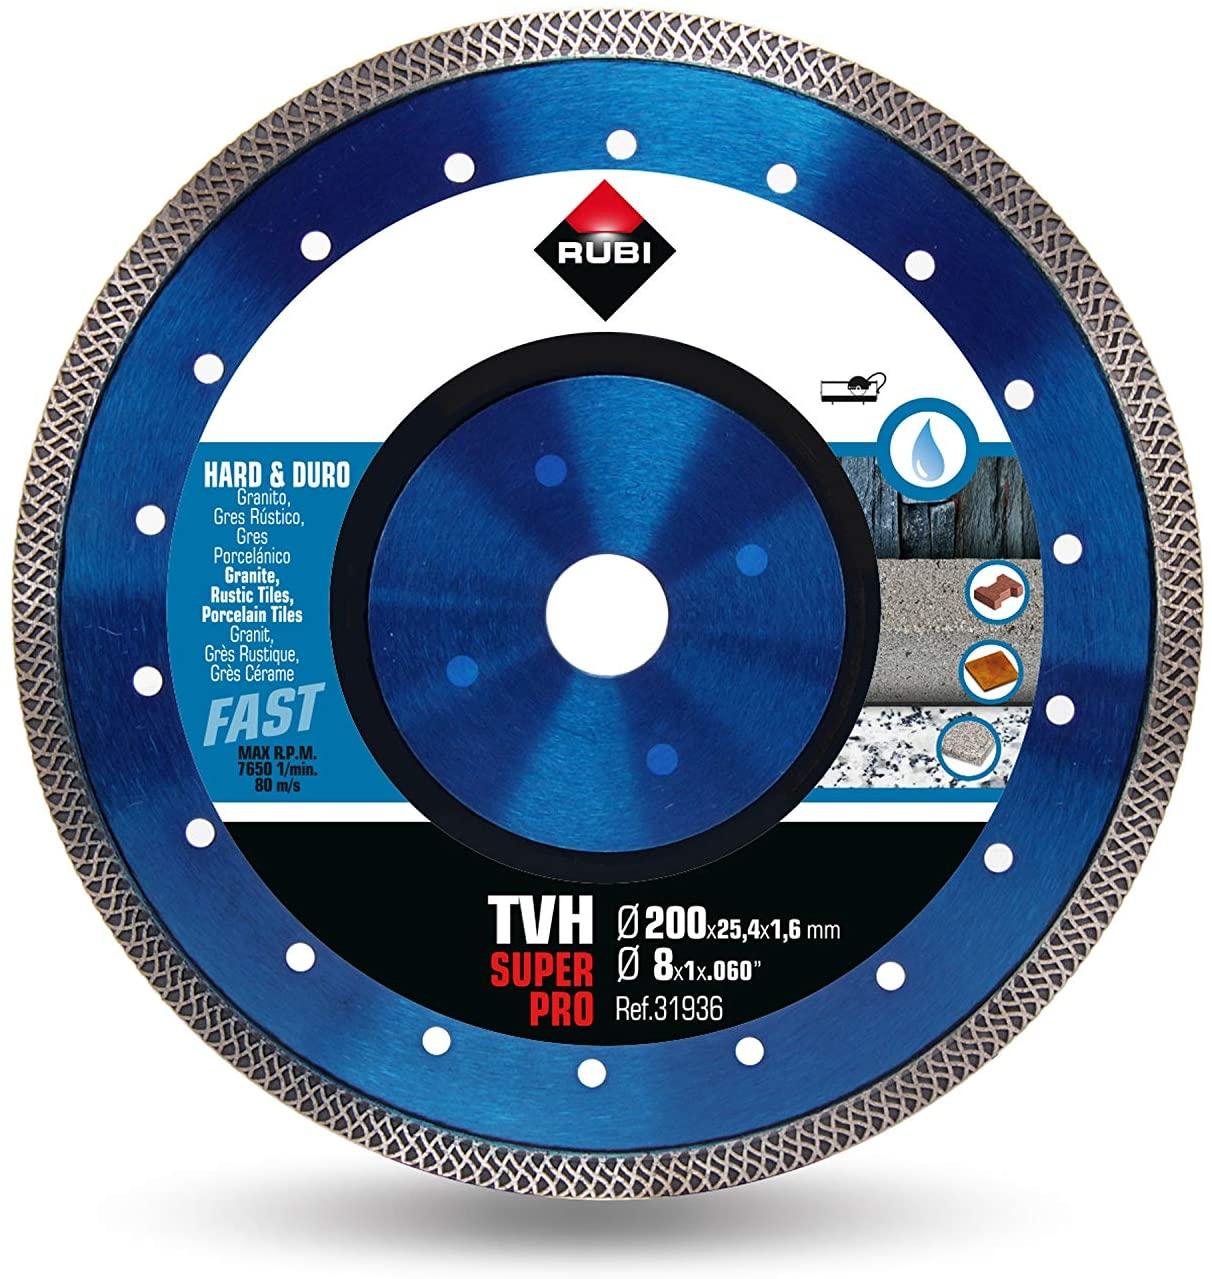 Rubi 31936 - 8″ Hard Material Turbo Viper Diamond Blade, TVH-200 SUPERPRO